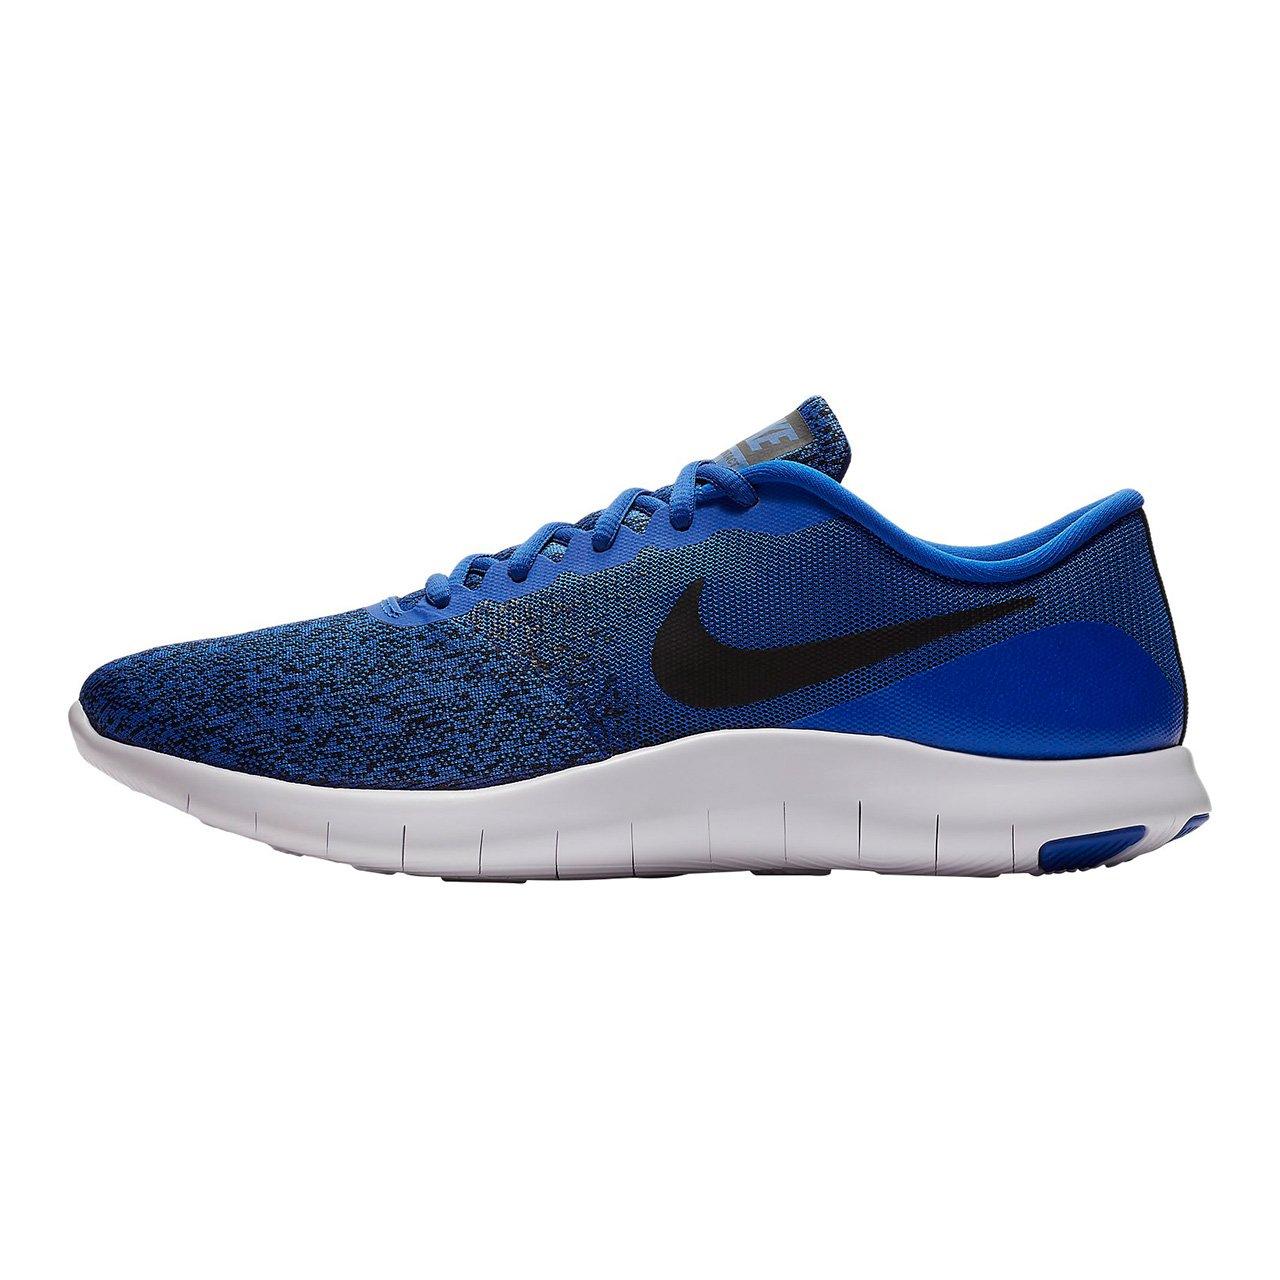 af421b9def045 Amazon.com: NIKE Mens Flex Contact Running Shoes, Racer Blue/Black ...